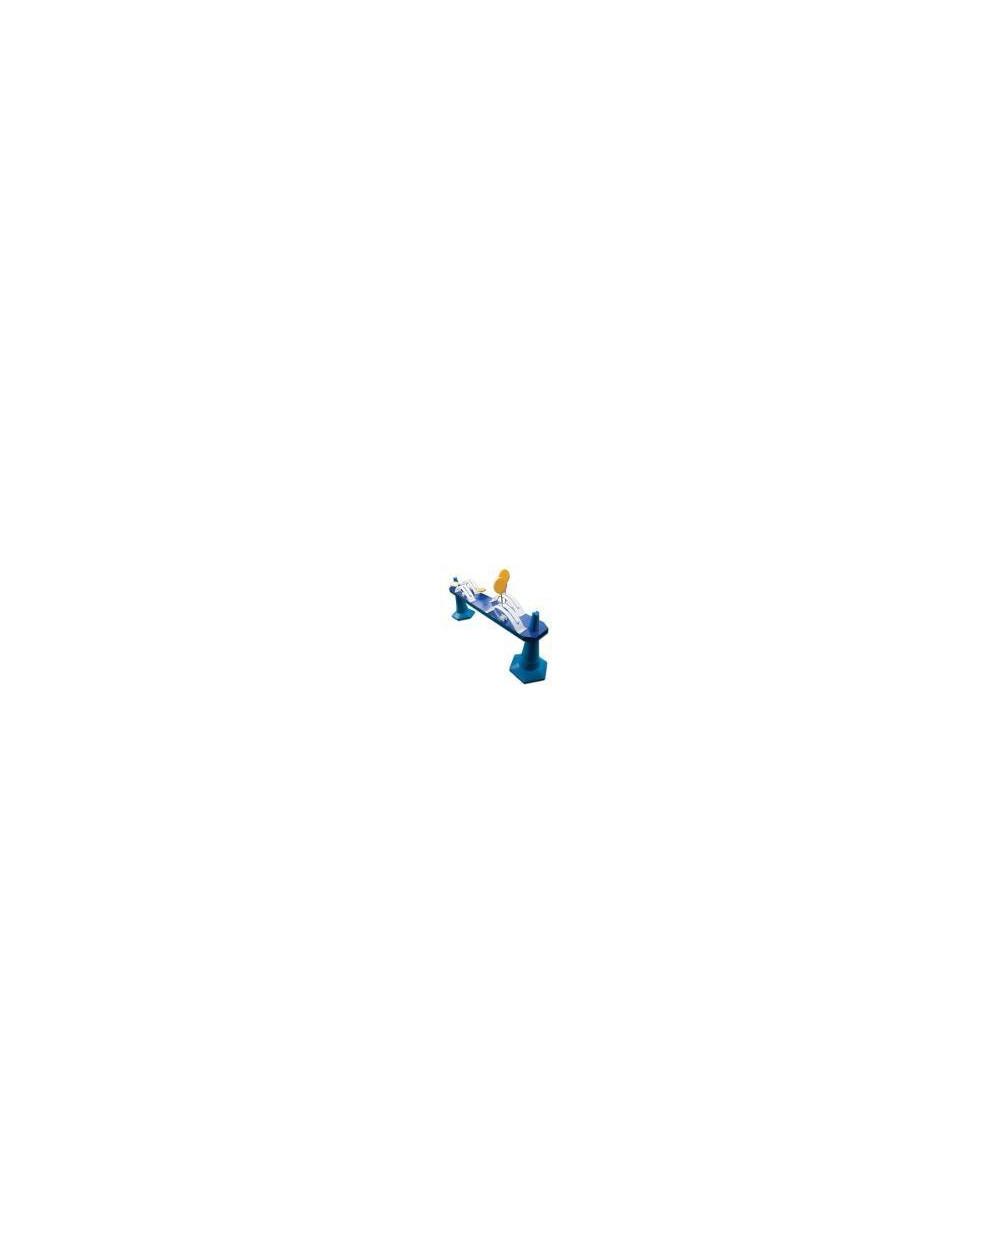 Jousting + Lance (sans support)